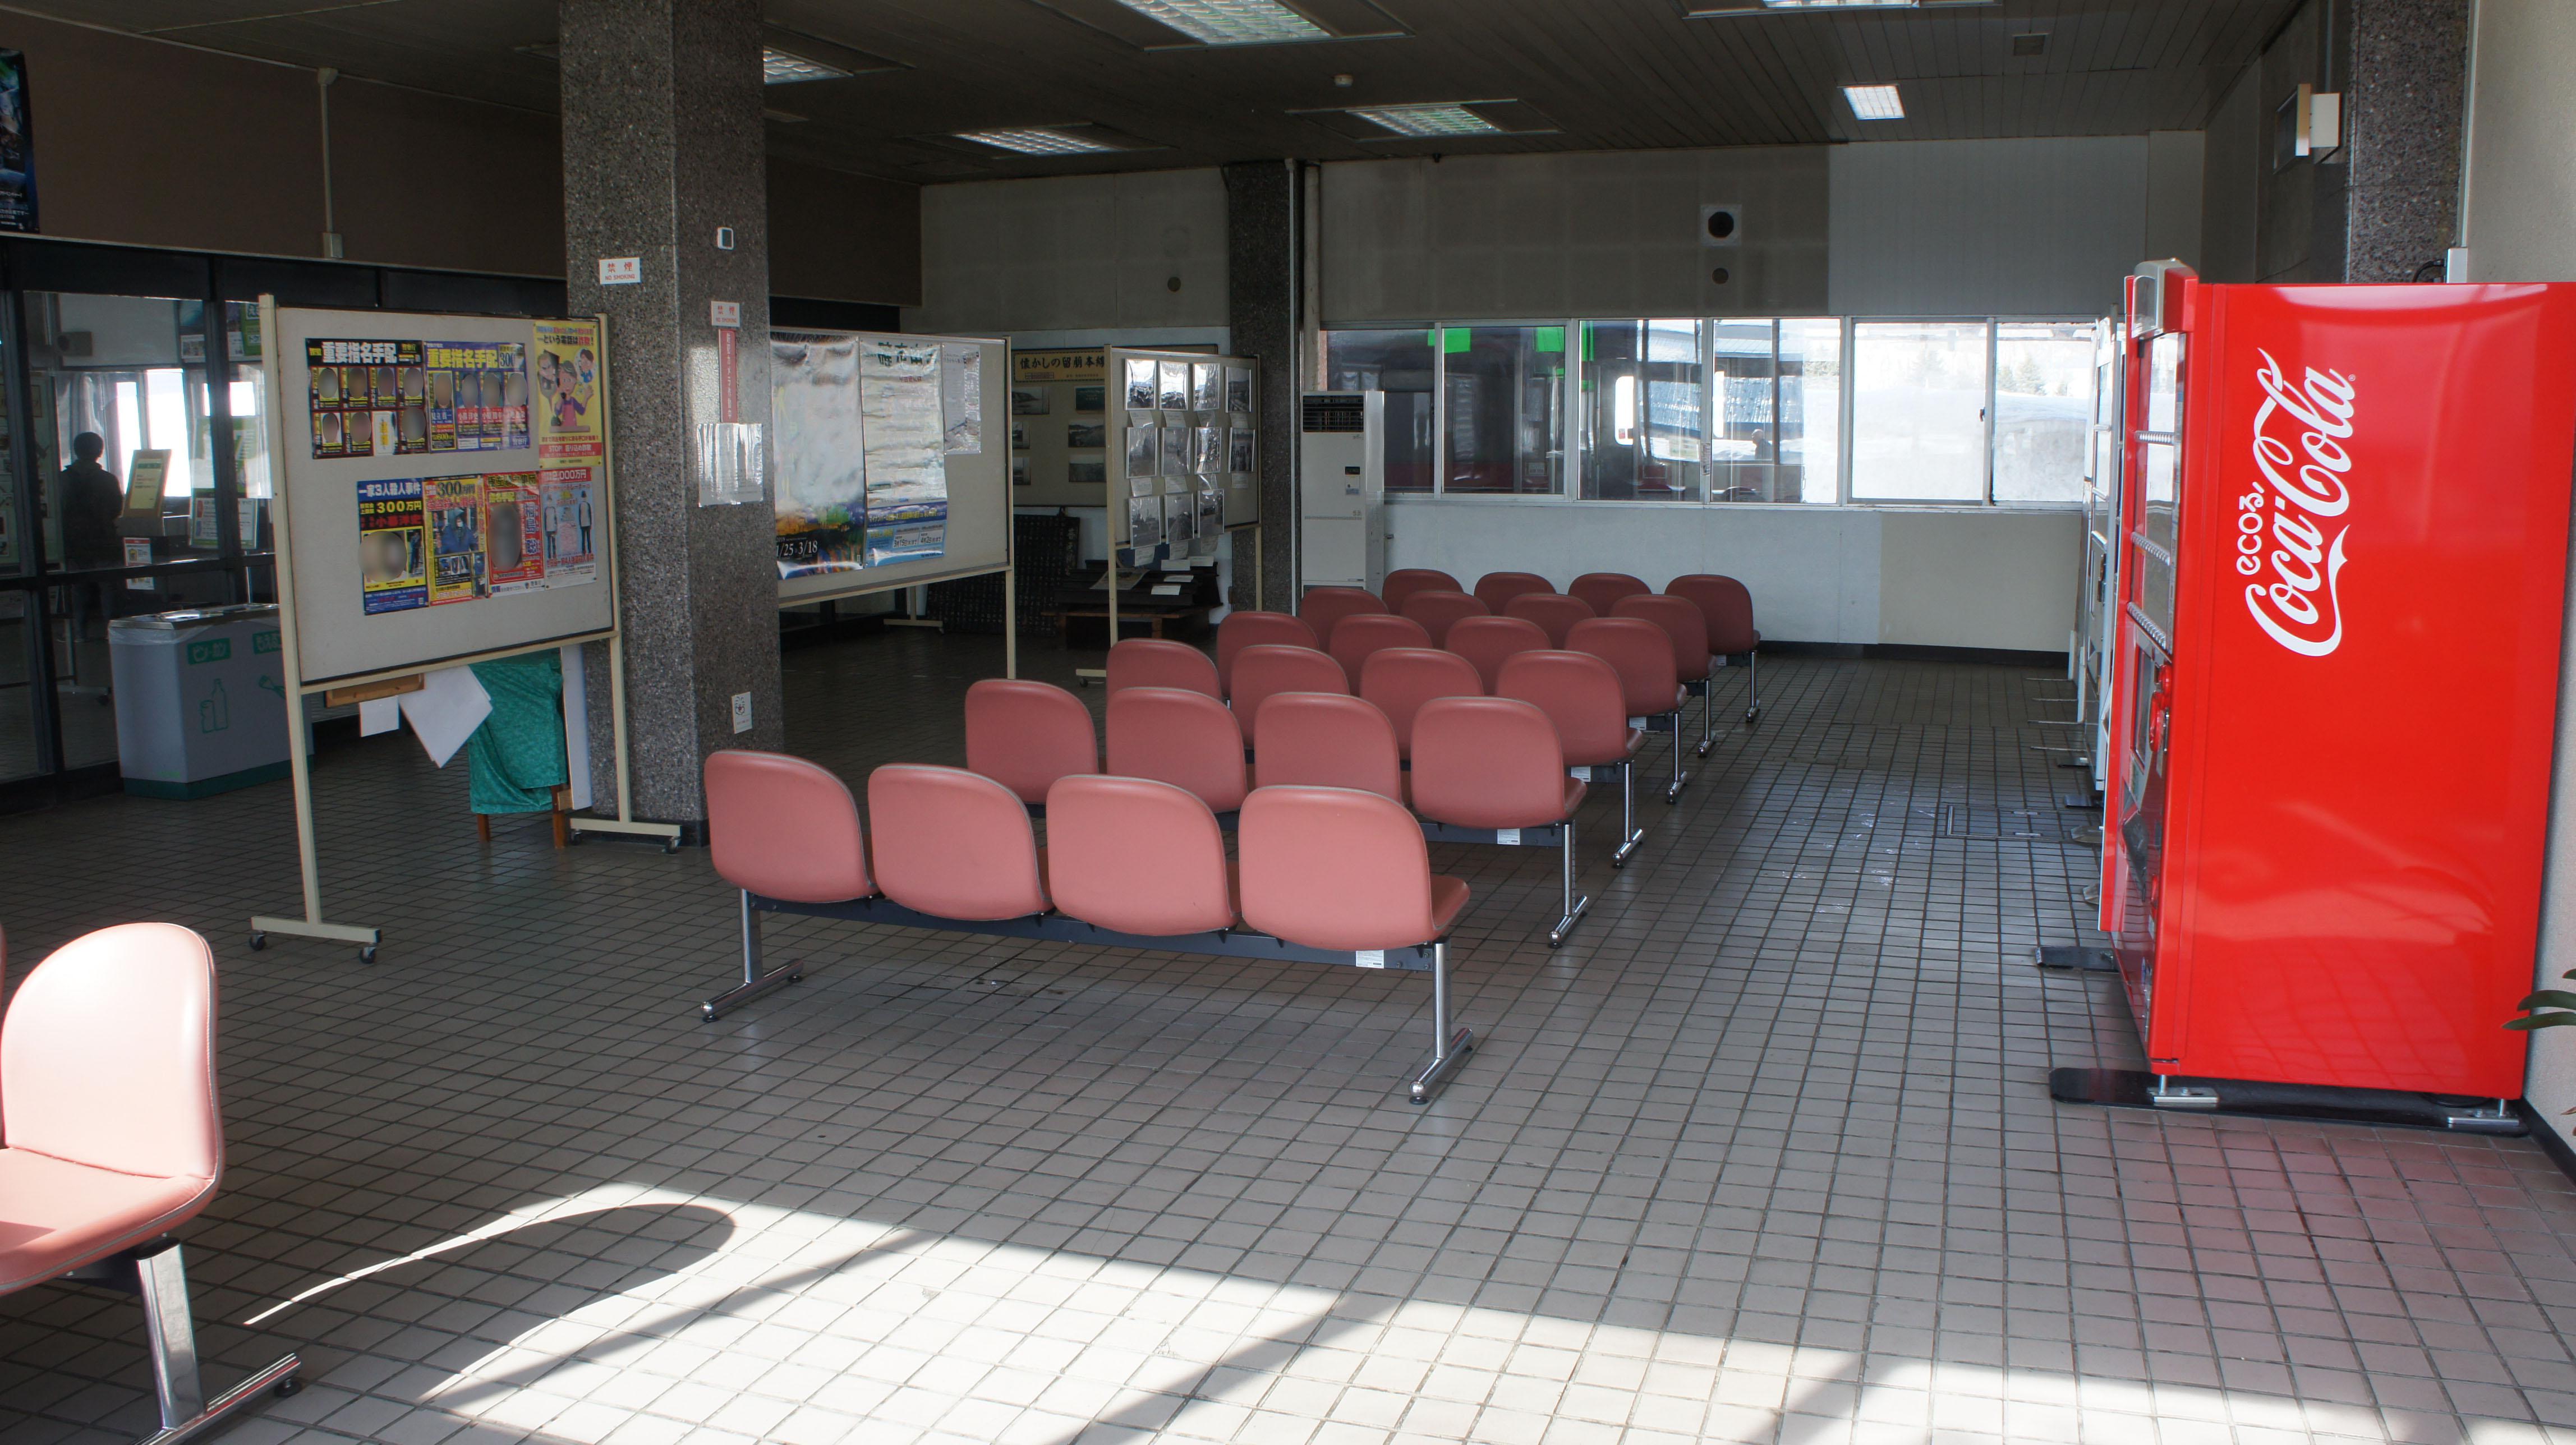 https://upload.wikimedia.org/wikipedia/commons/7/71/JR_Rumoi-Main-Line_Rumoi_Station_Waiting_room.jpg